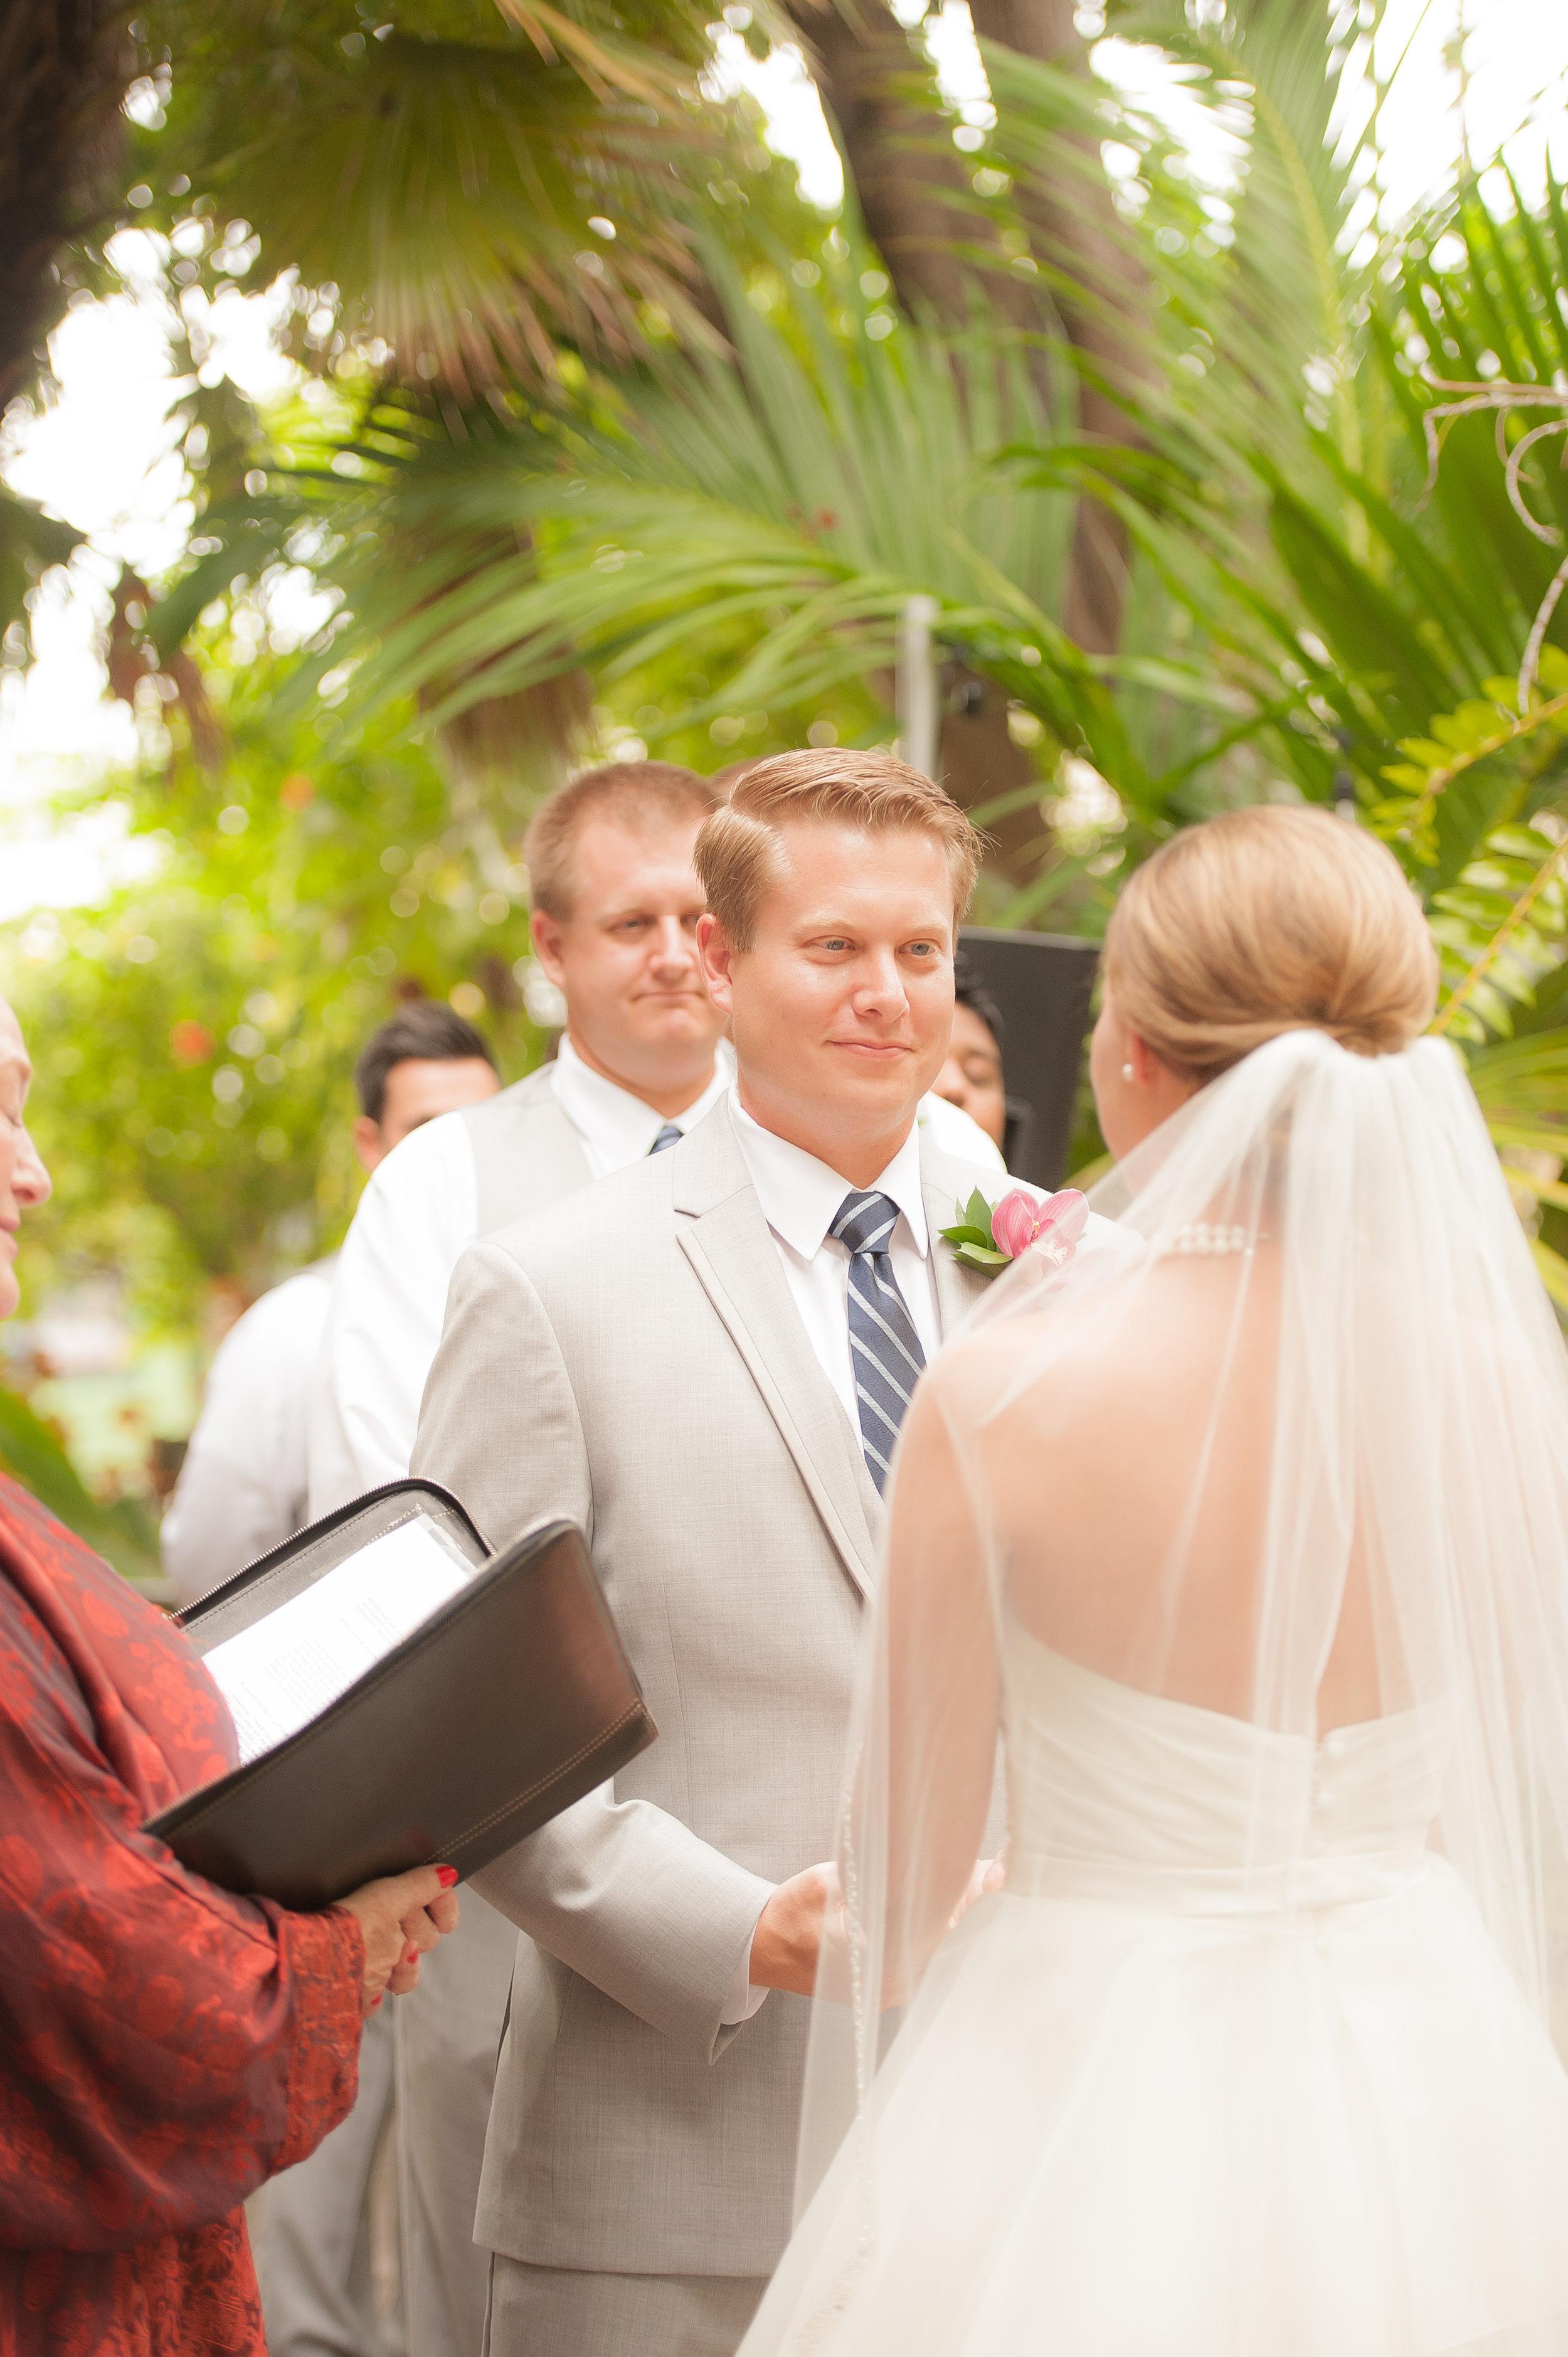 Amanda+James_Audubon House Key West Wedding18.jpg